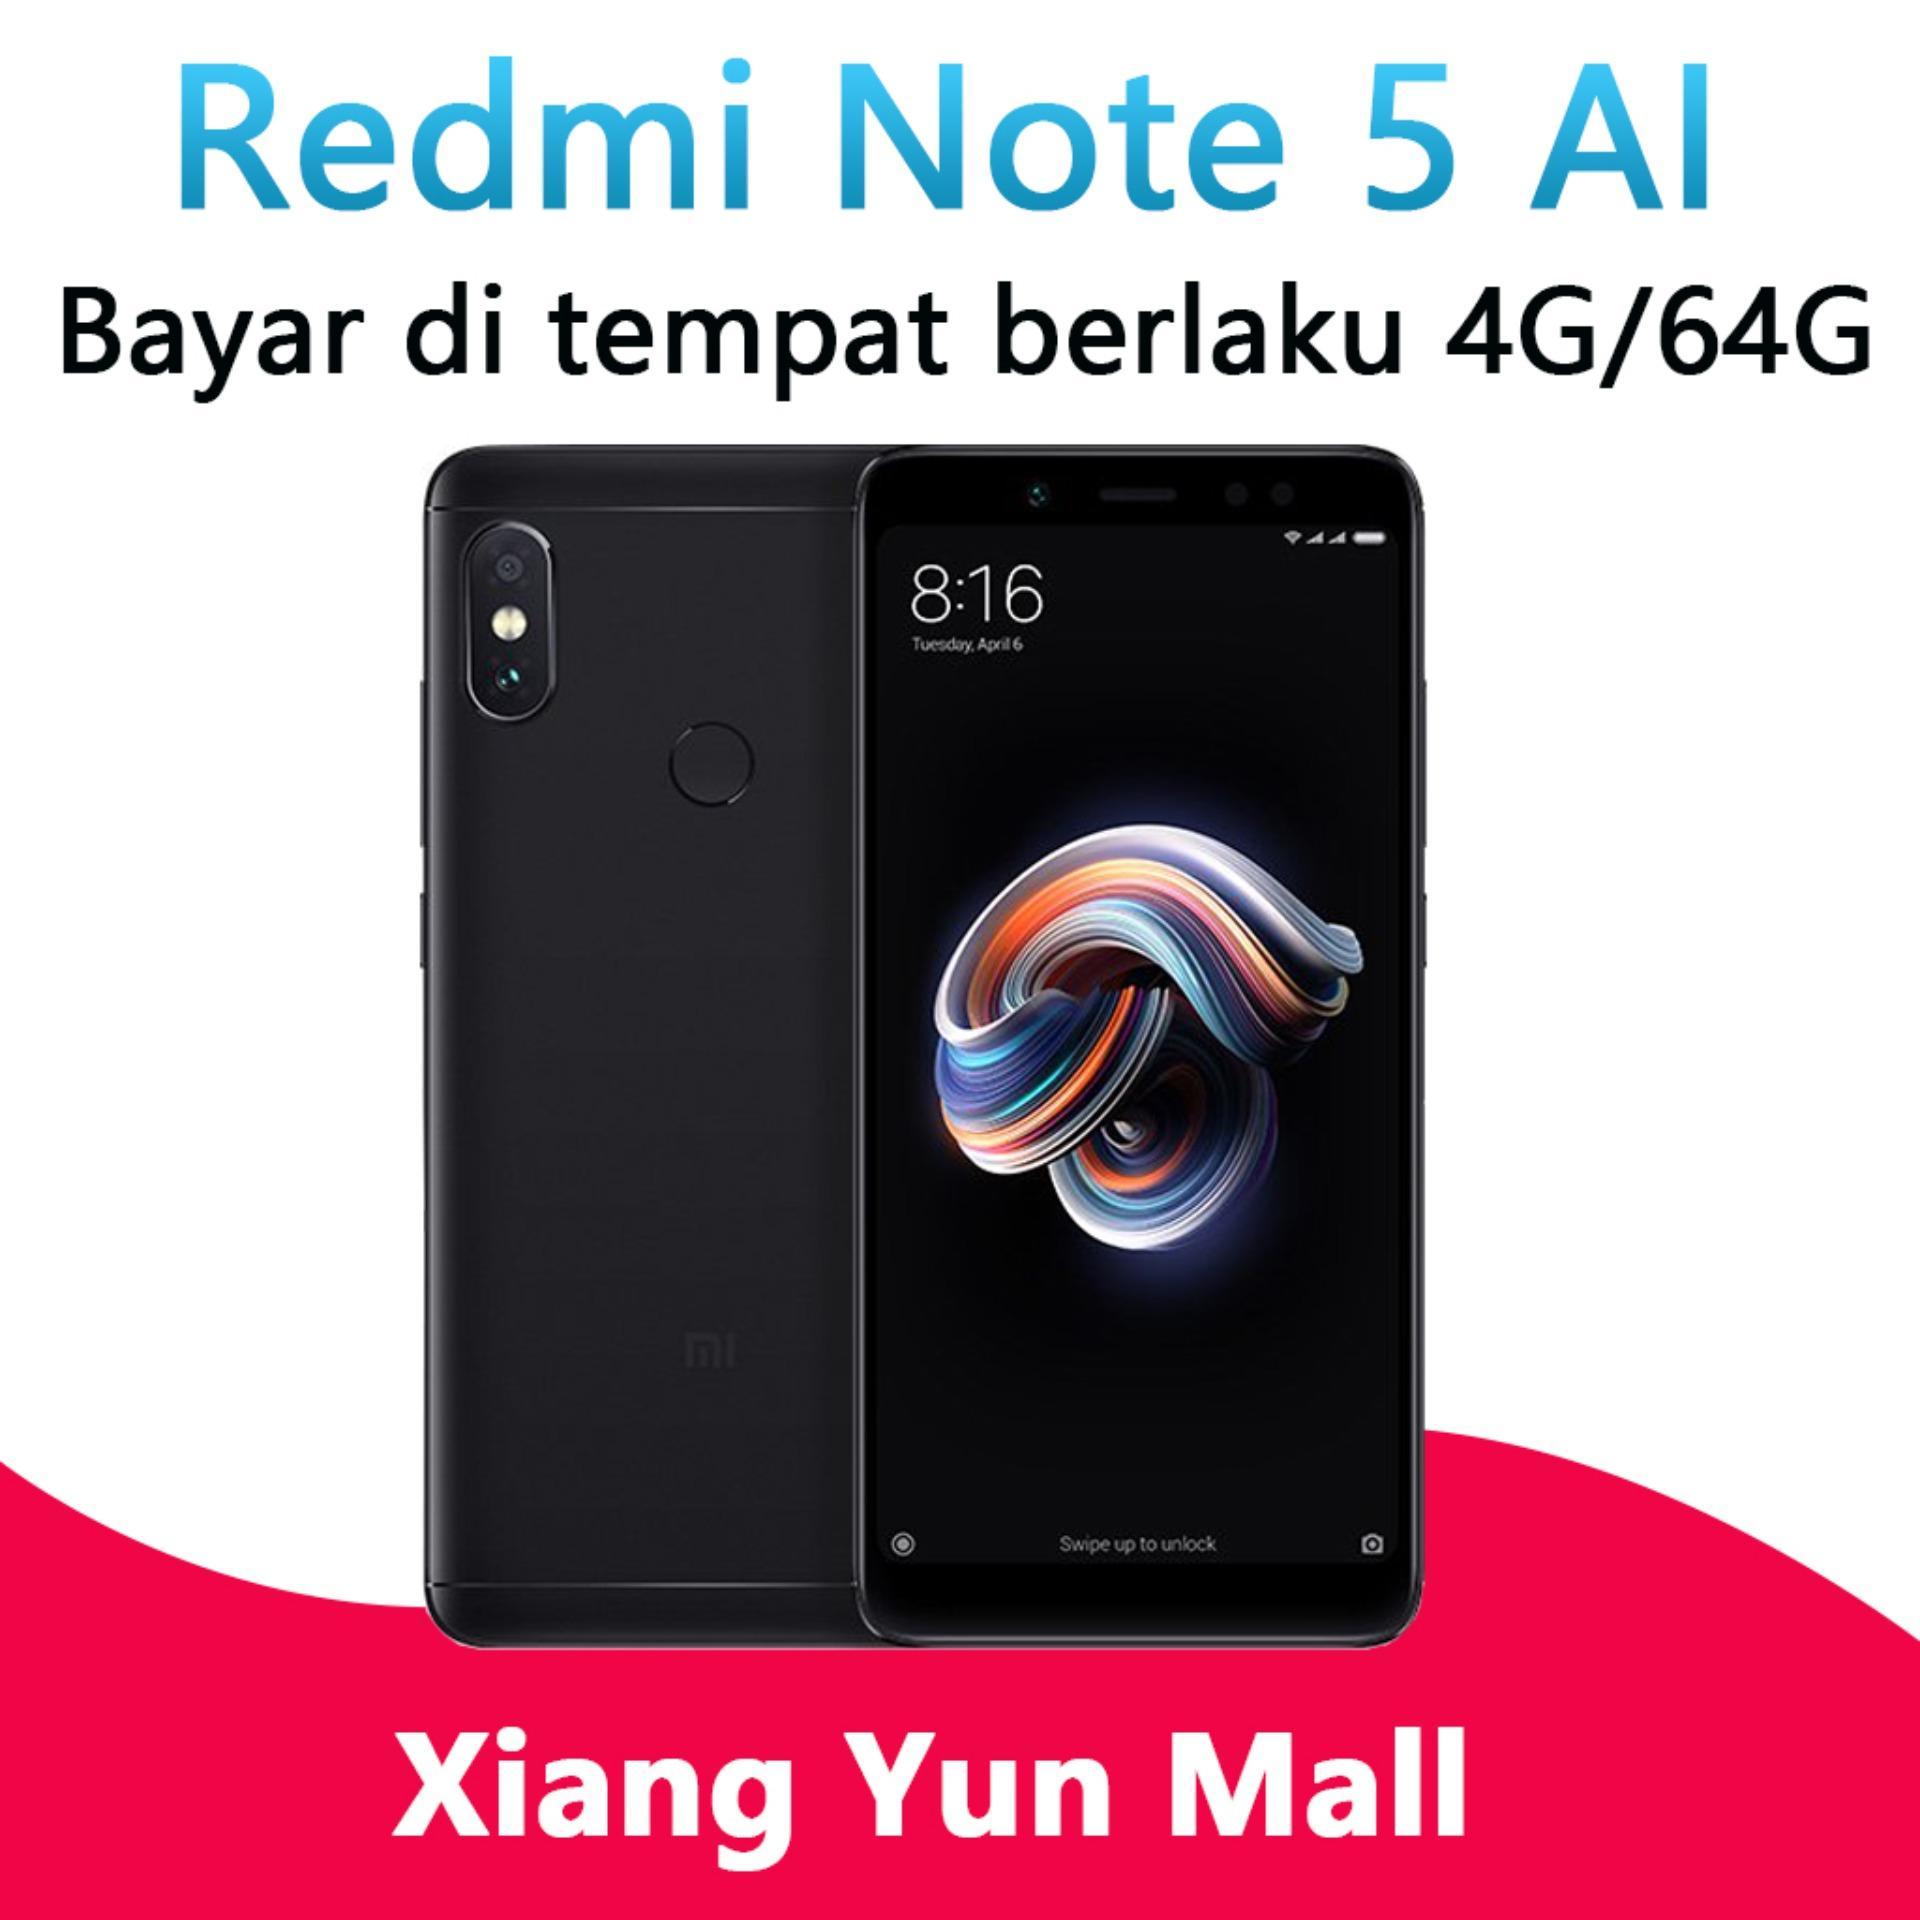 Xiaomi S2 Global Version Ram 3 32gb Distributor Indonesia Redmi 5 Plus 4gb 64gb Black Garansi Distri 1 Tahun Note Smartphone China Ponsel Ai